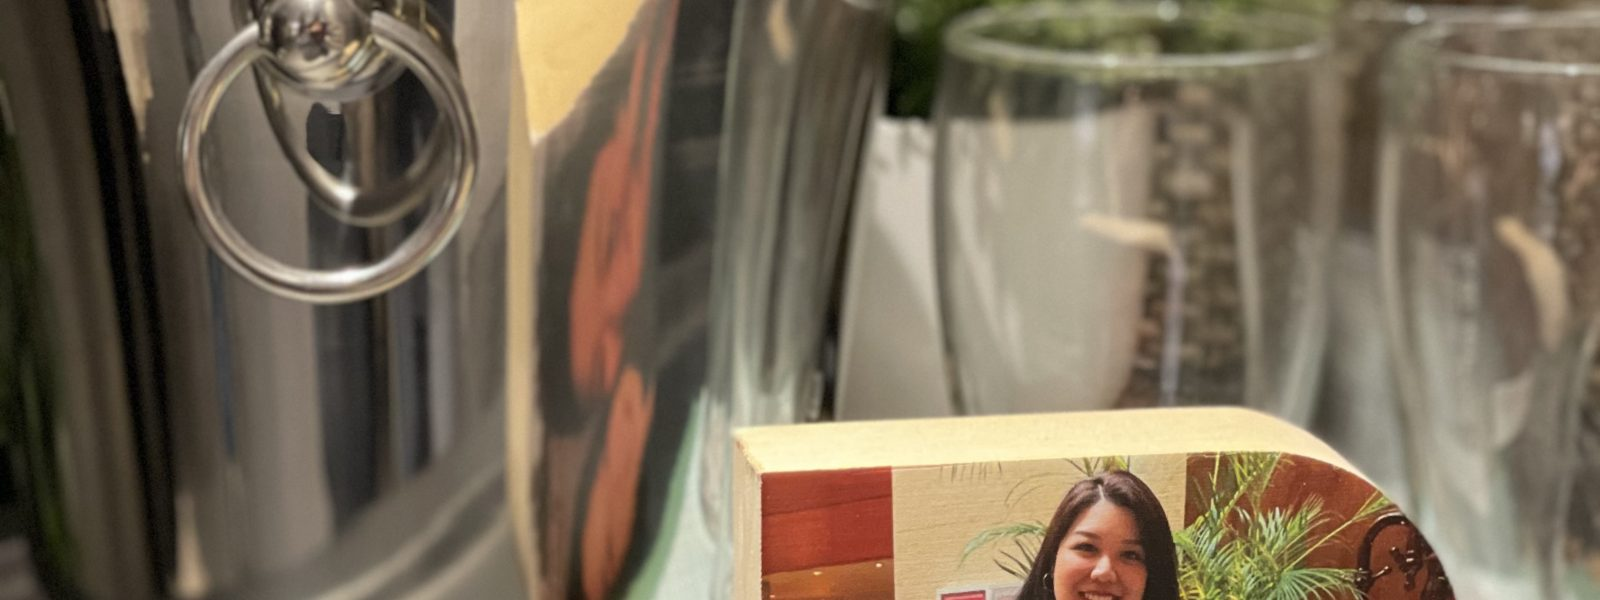 Advantages of Using Wooden Photo Blocks